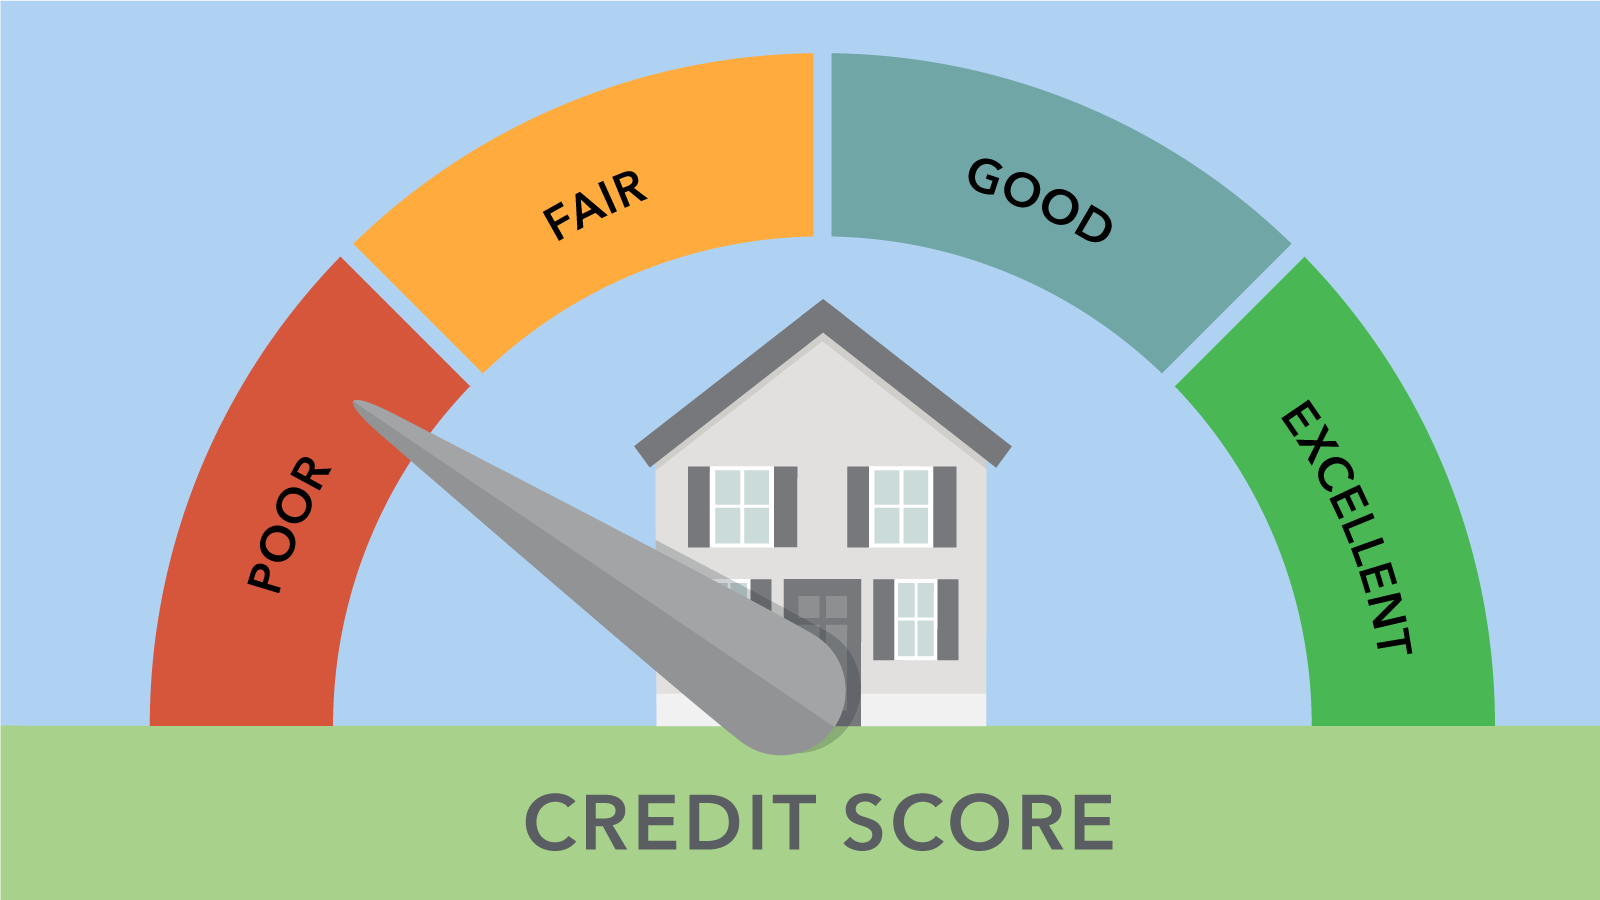 Credit Score Check Header Image